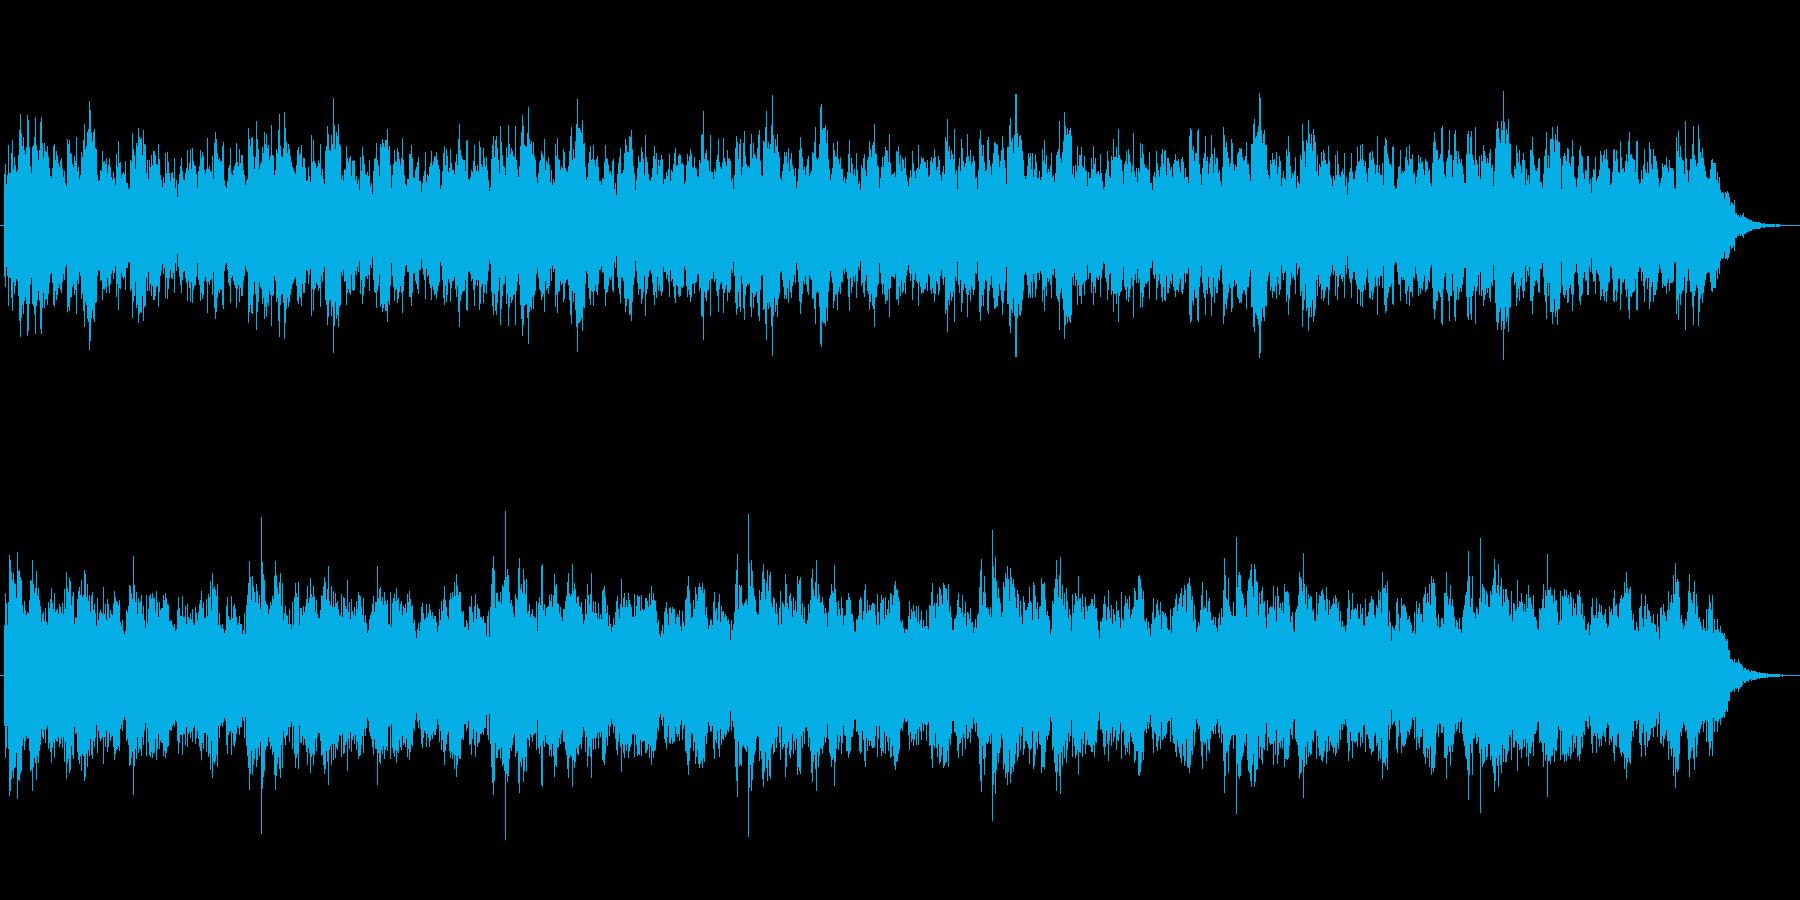 【BGM】怖い話、怪談、心霊動画用BGMの再生済みの波形